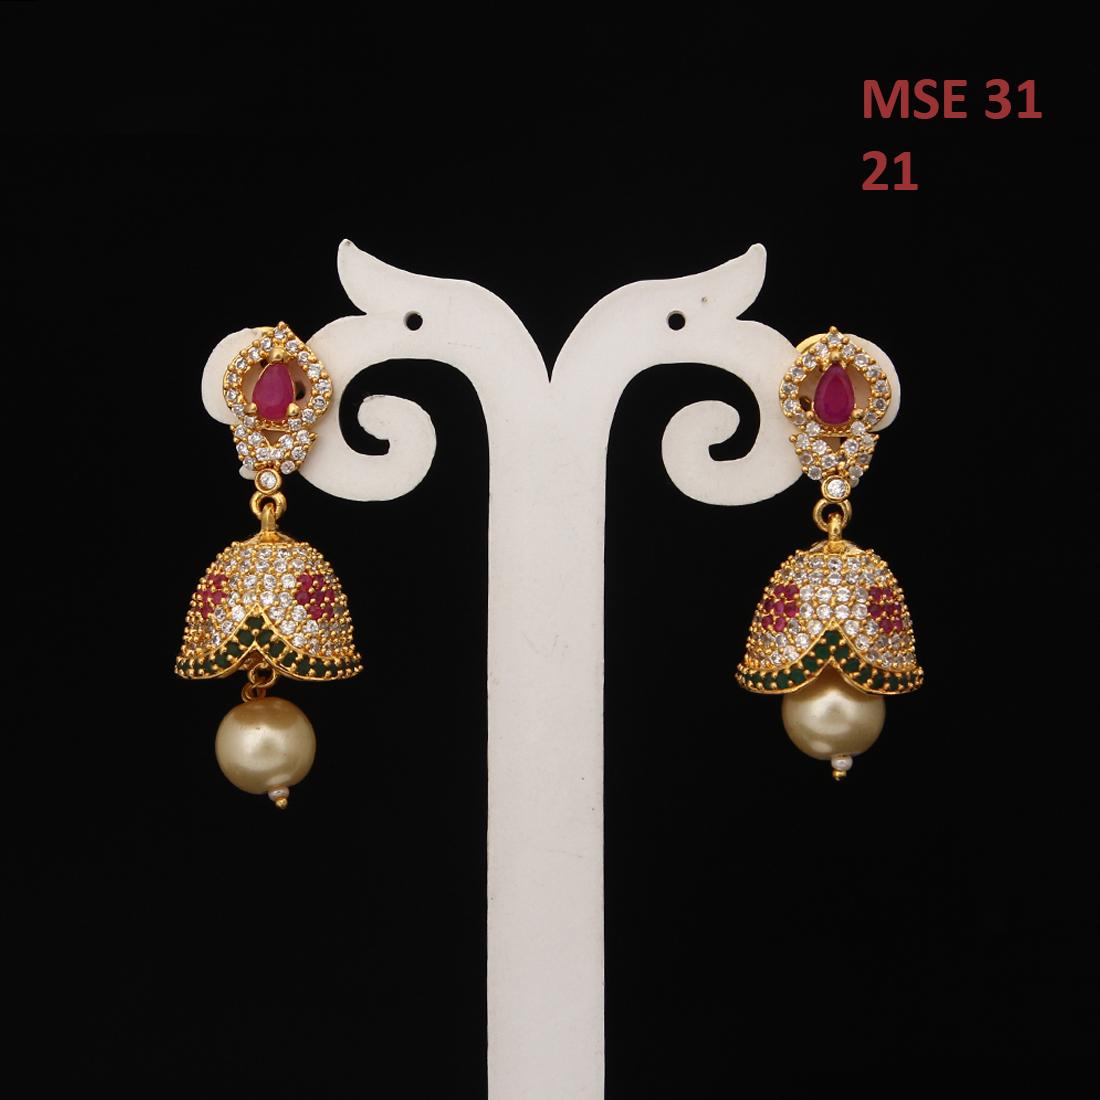 55Carat | Unique Stud Drops Earrings For Women Girls Ladies Cubic Zircon Gold Plated Baali Kundal Jewellery Fashion Jewellery MSE 31